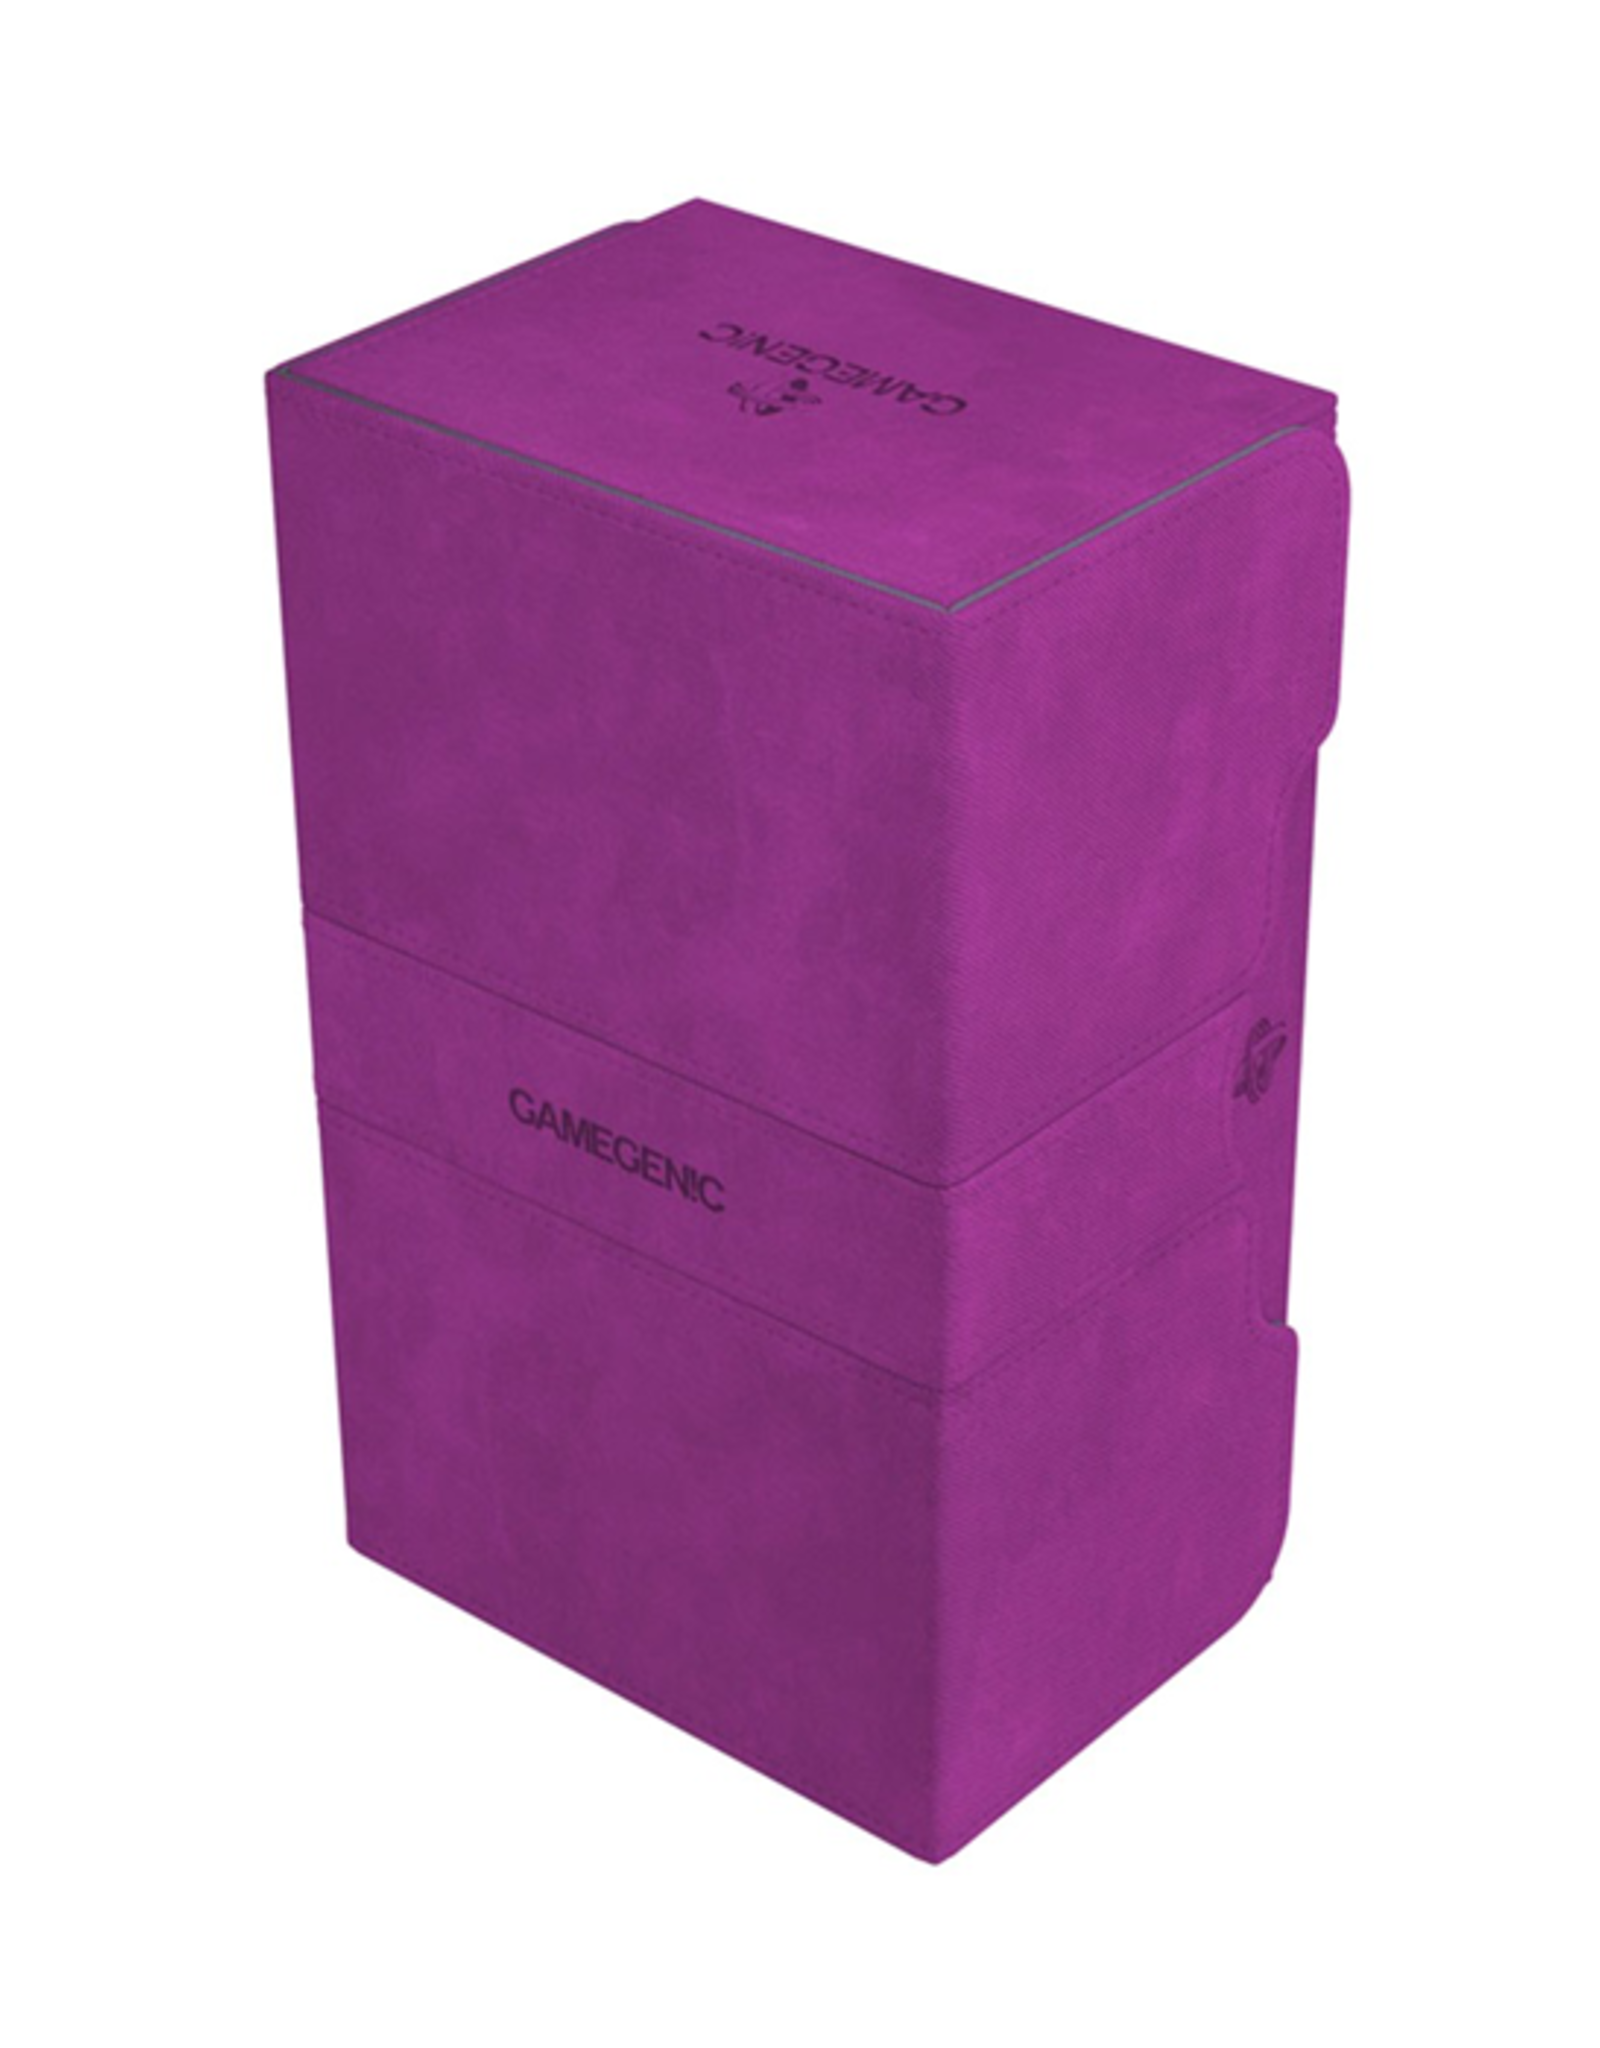 Gamegenic Gamegenic: Deck Box - Stronghold 200+ - Purple